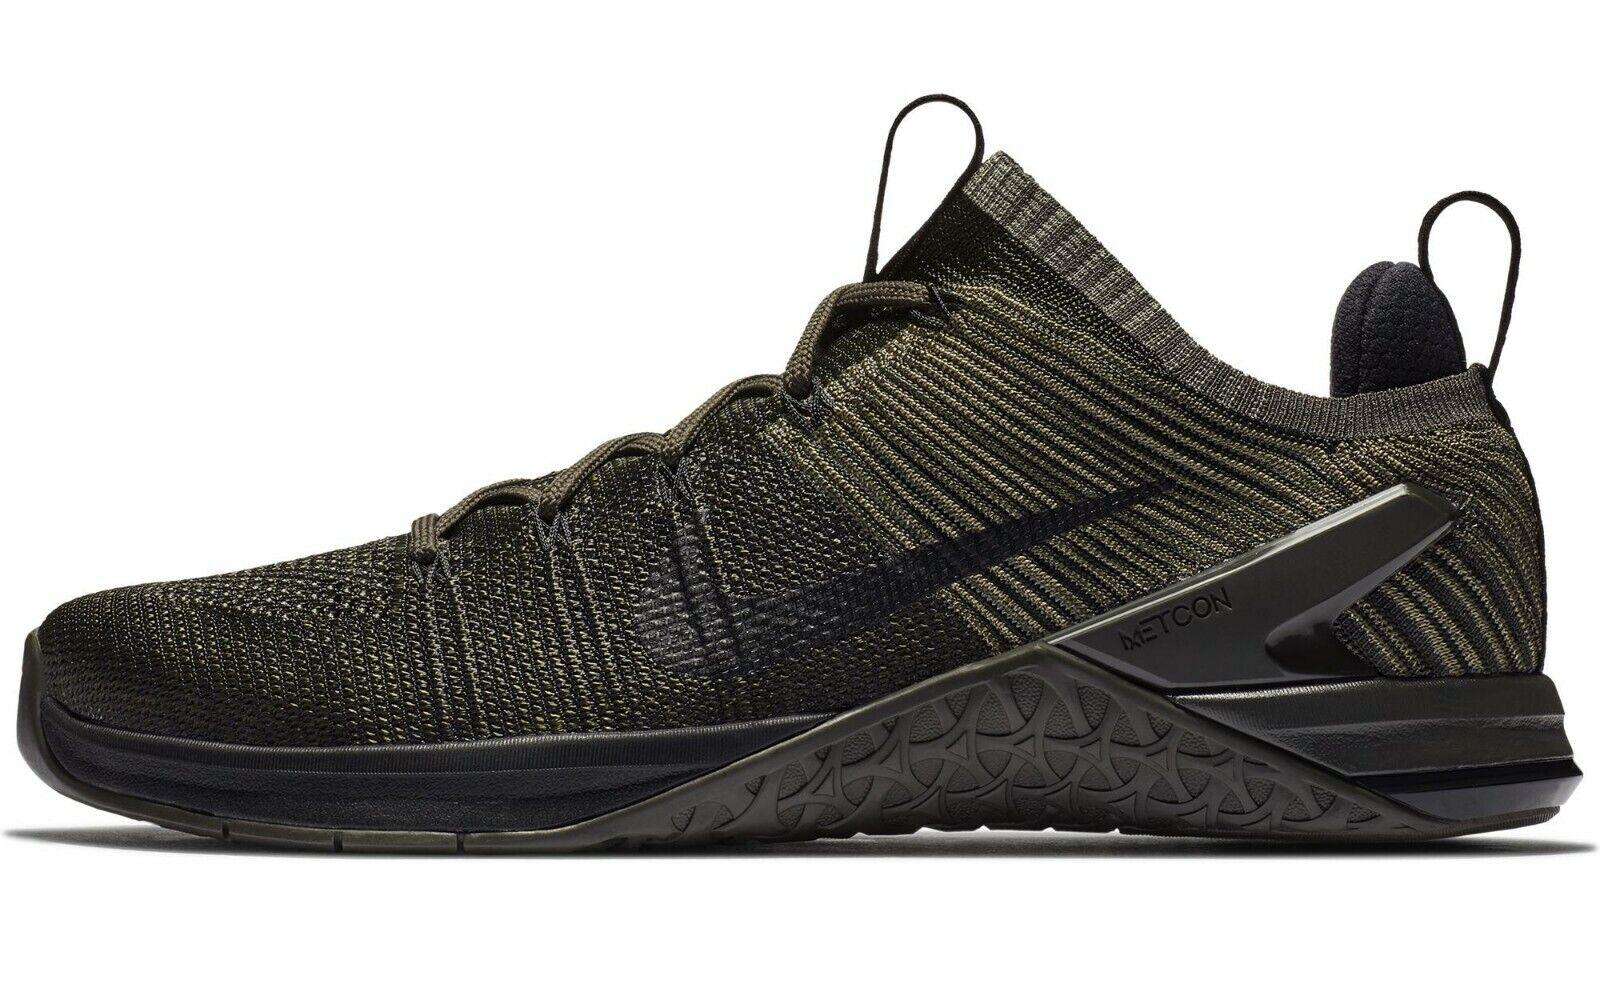 Nike Metcon DSX Flyknit 2 Size 12 Training Dark Stucco Black 924423-008 Mens